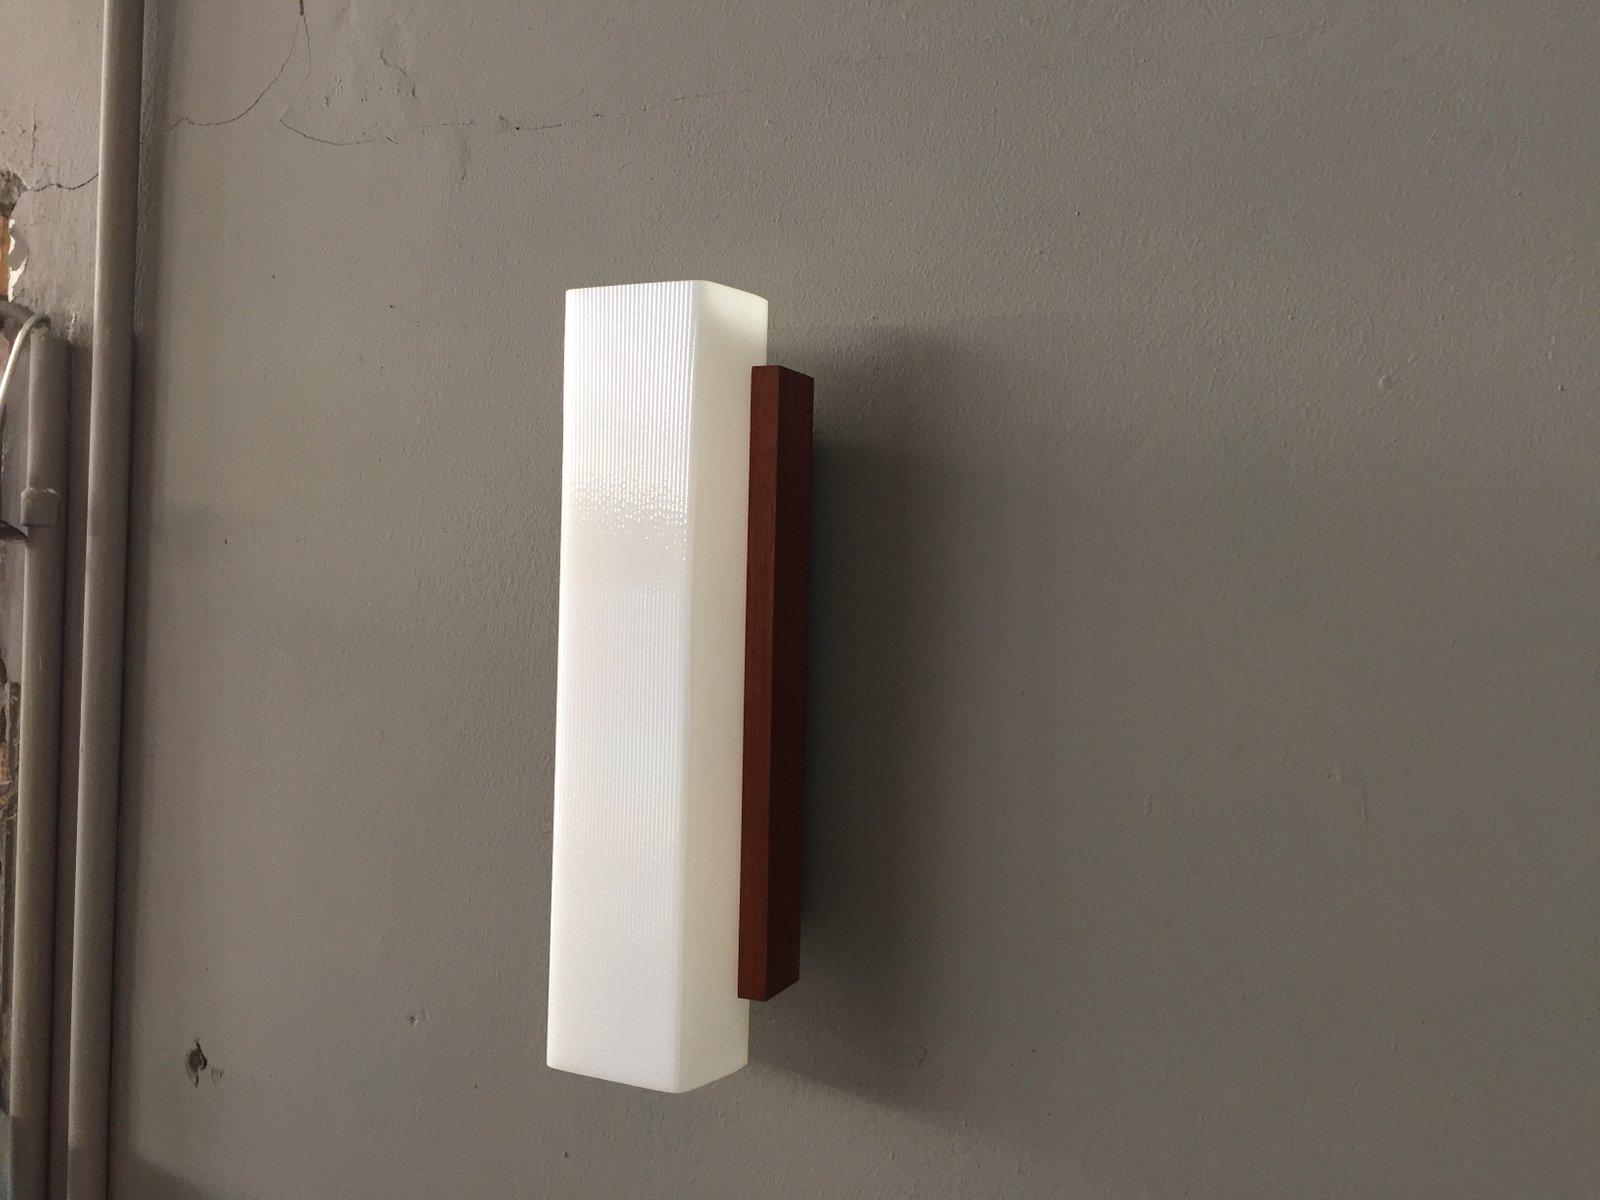 vintage wandlampe aus holz und kunststoff bei pamono kaufen. Black Bedroom Furniture Sets. Home Design Ideas